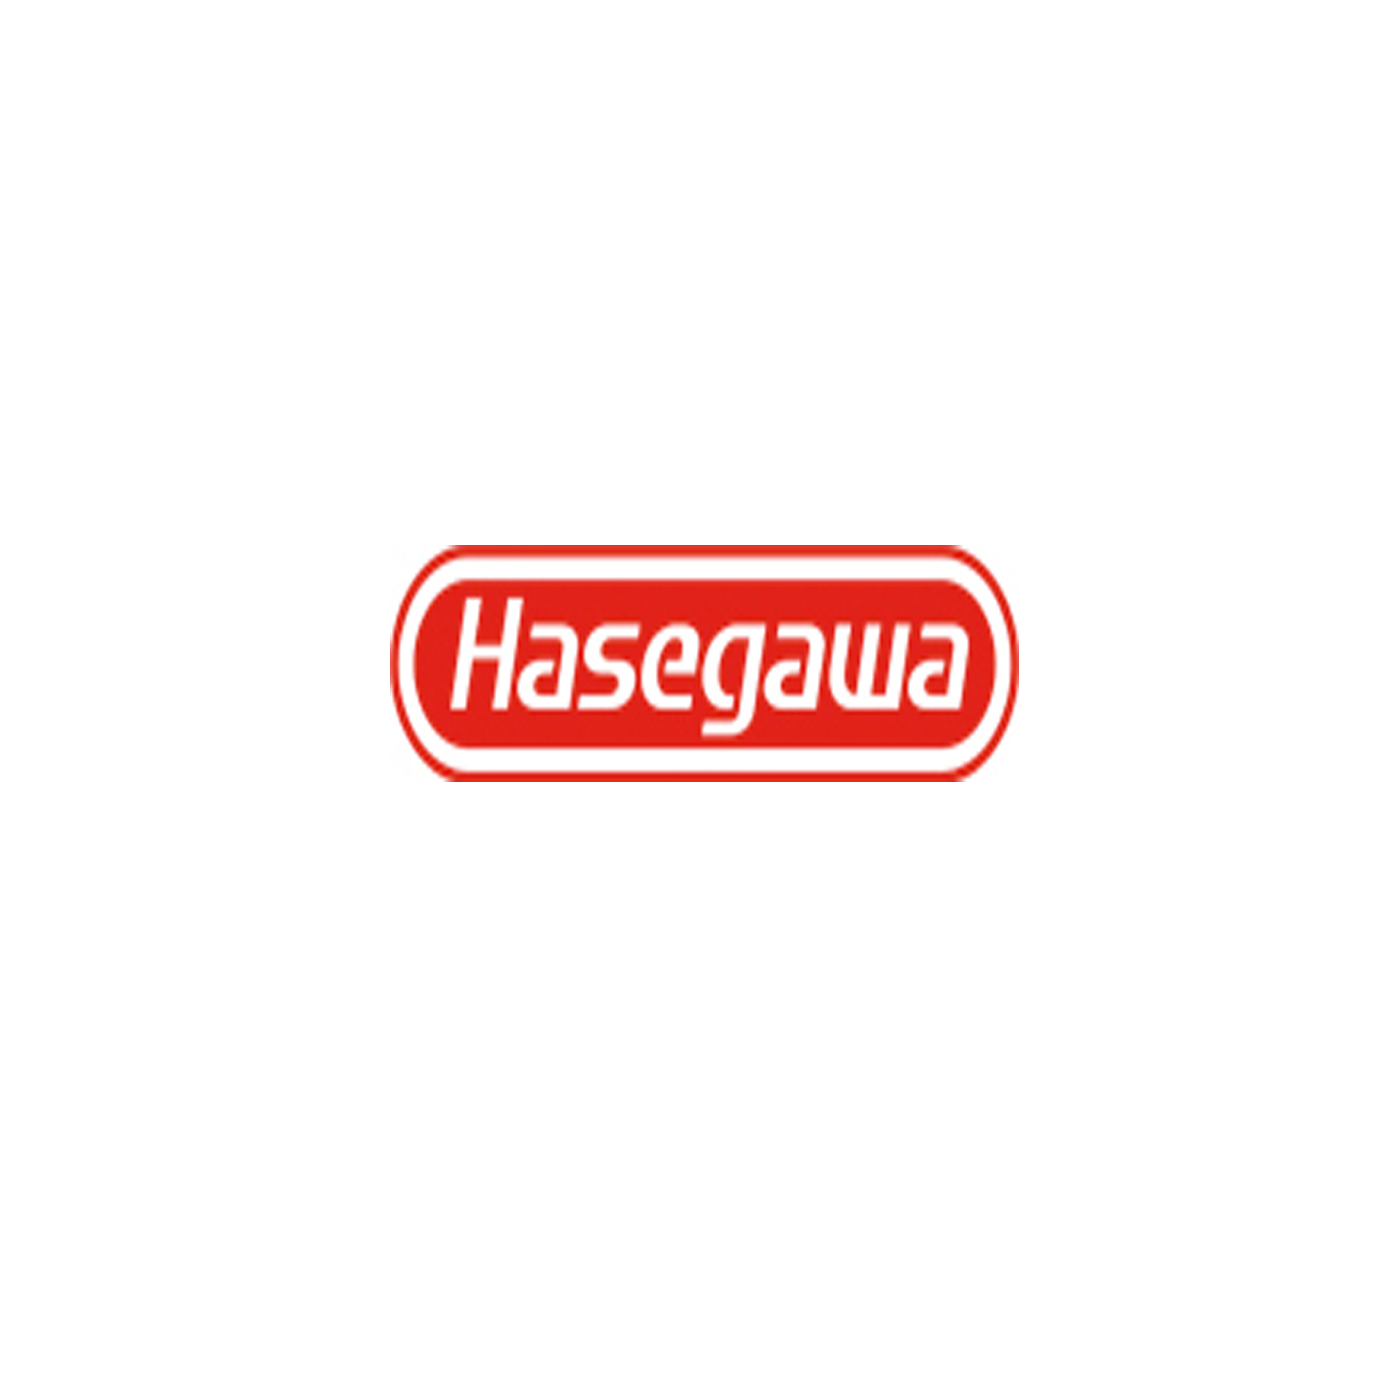 Hasegawa Square copy.jpg